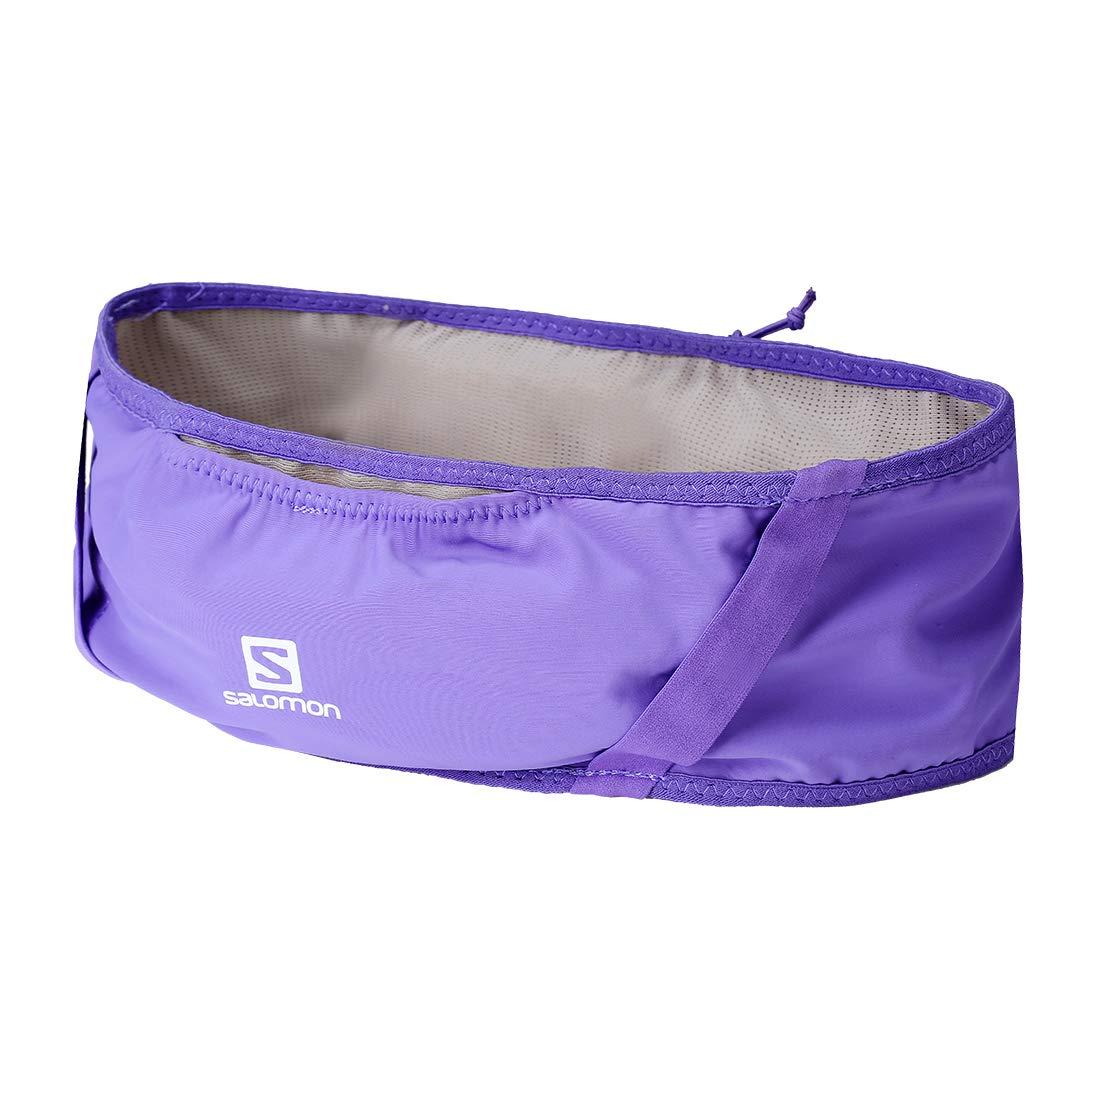 Salomon Unisex Pulse Belt, Purple Opulence, Medieval Blue, S